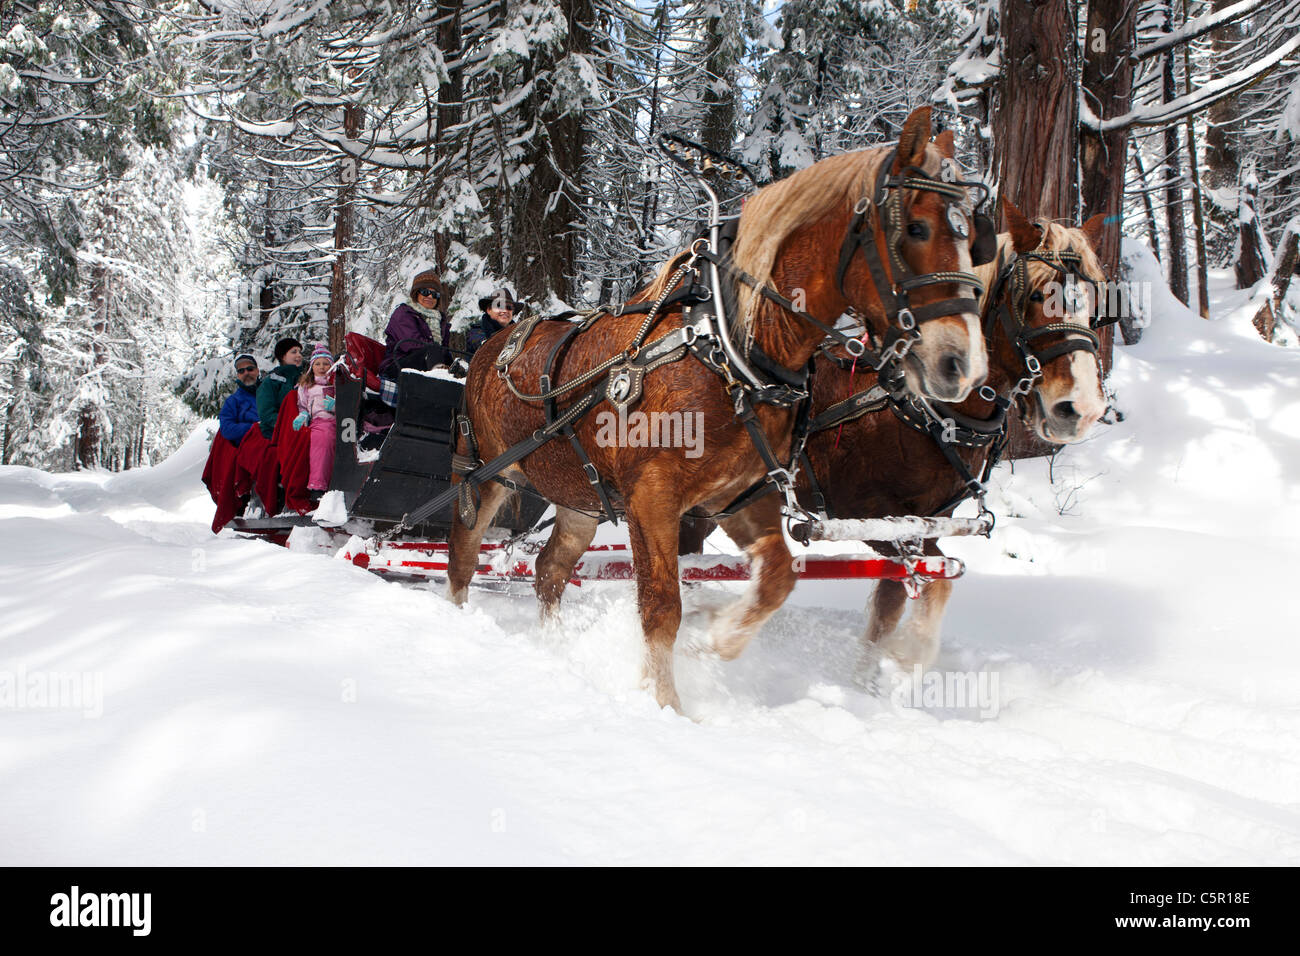 horses pulling sleigh stock photos horses pulling sleigh stock